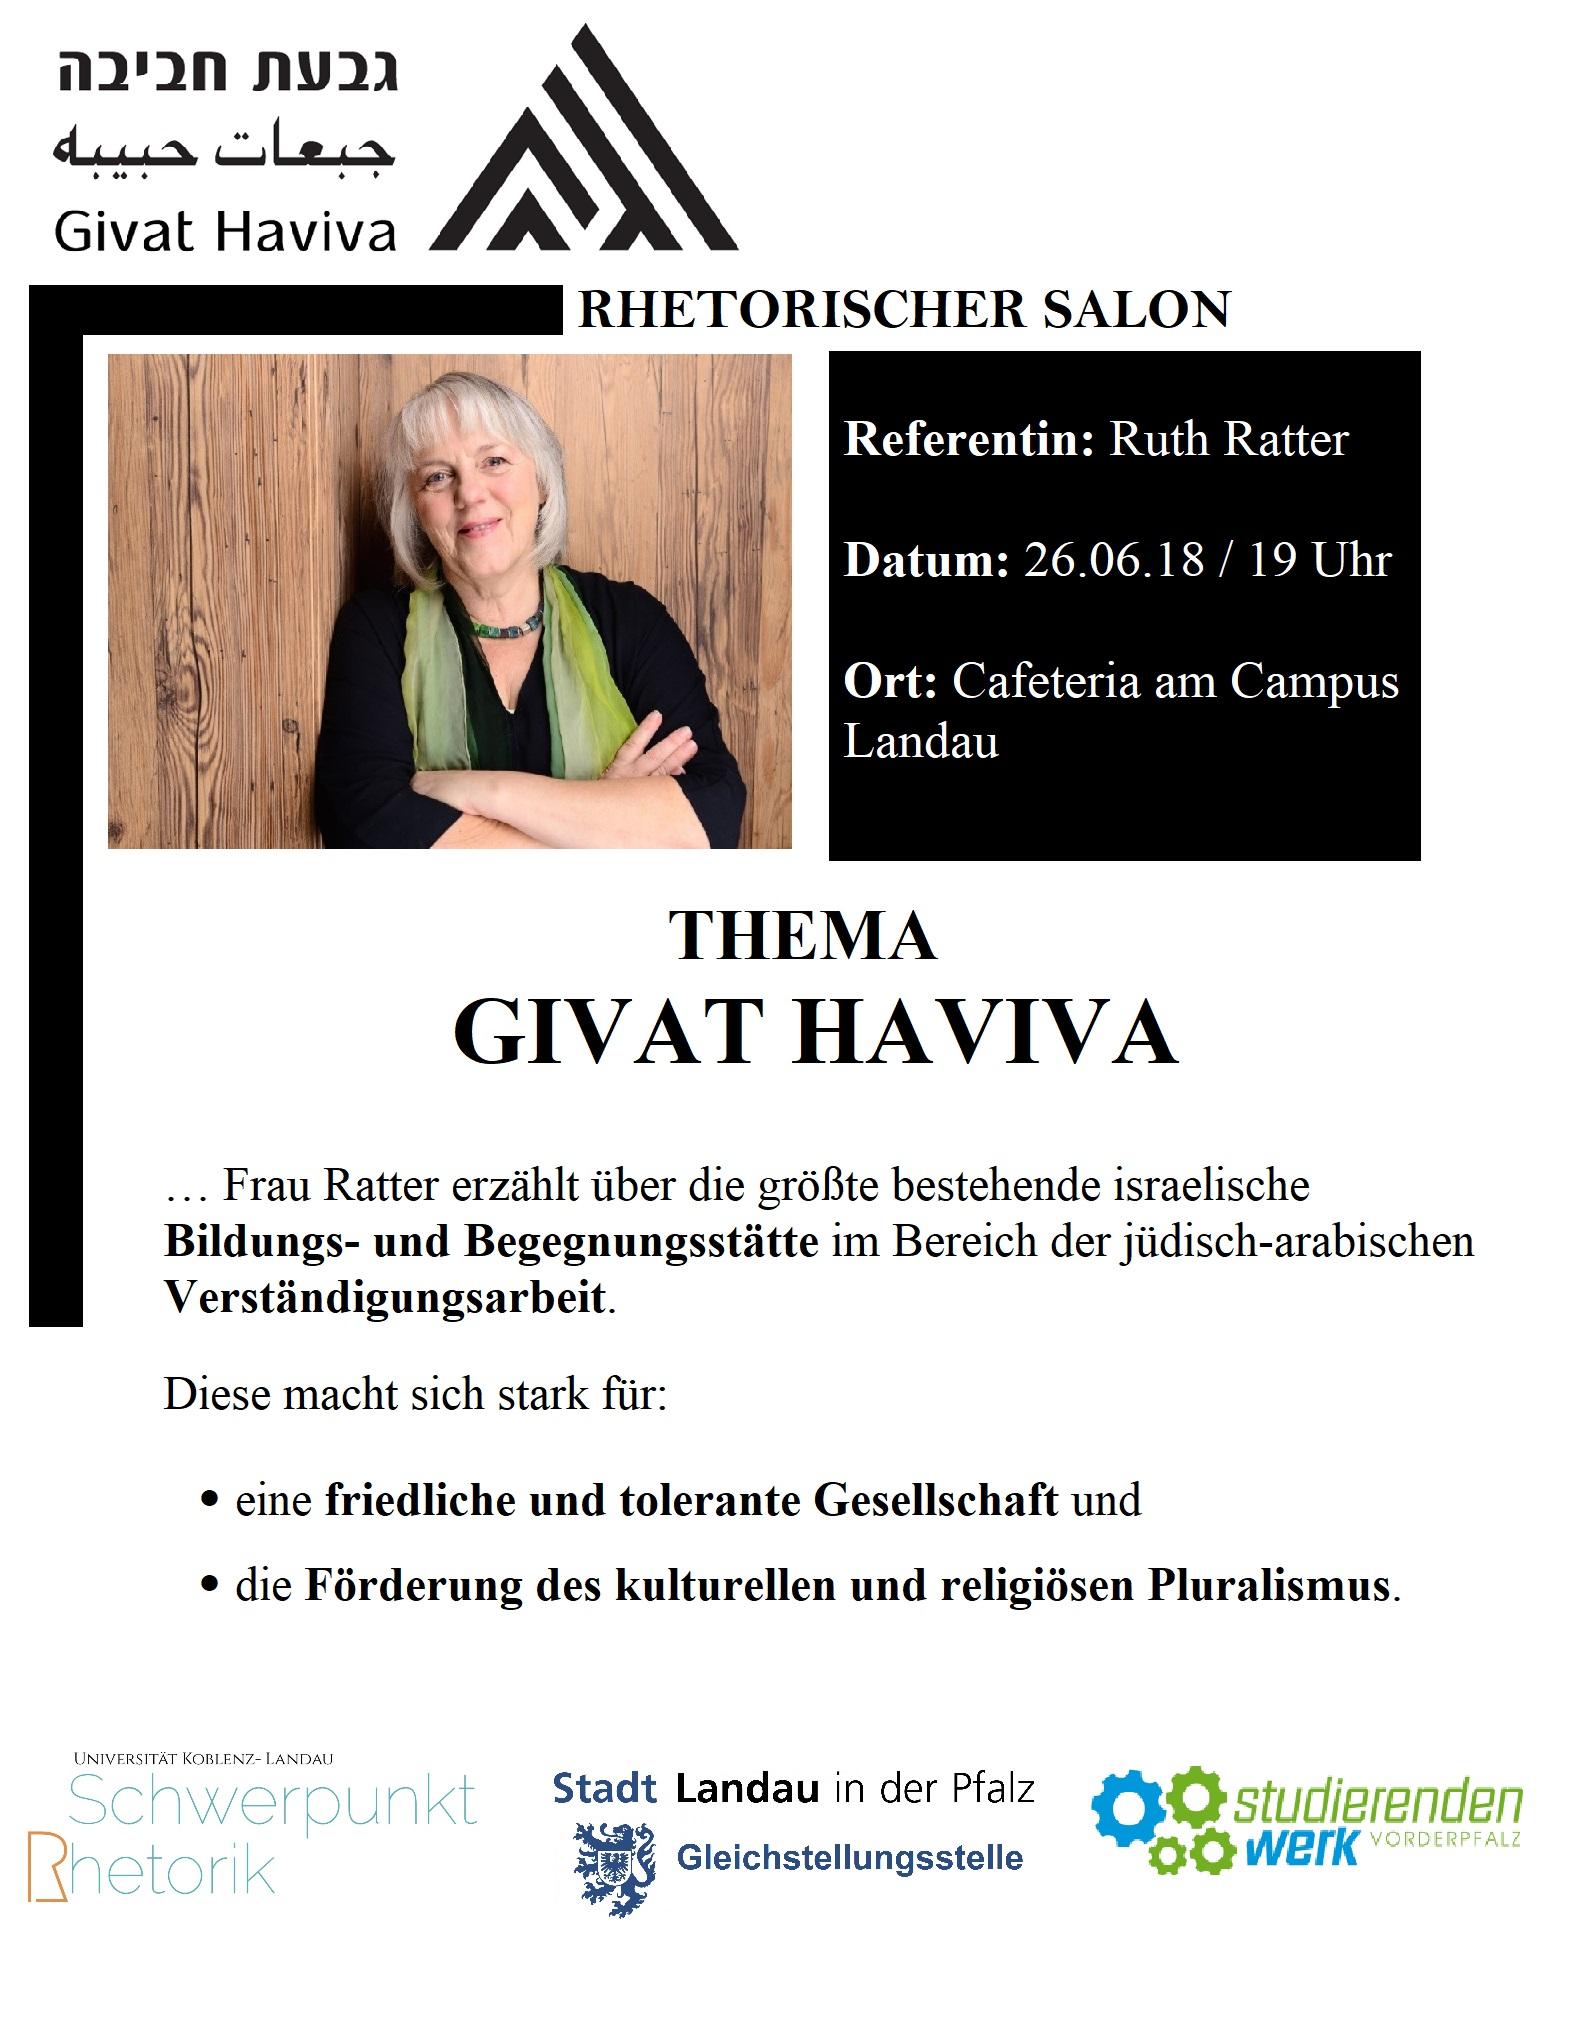 Plakat Rhetorischer Salon